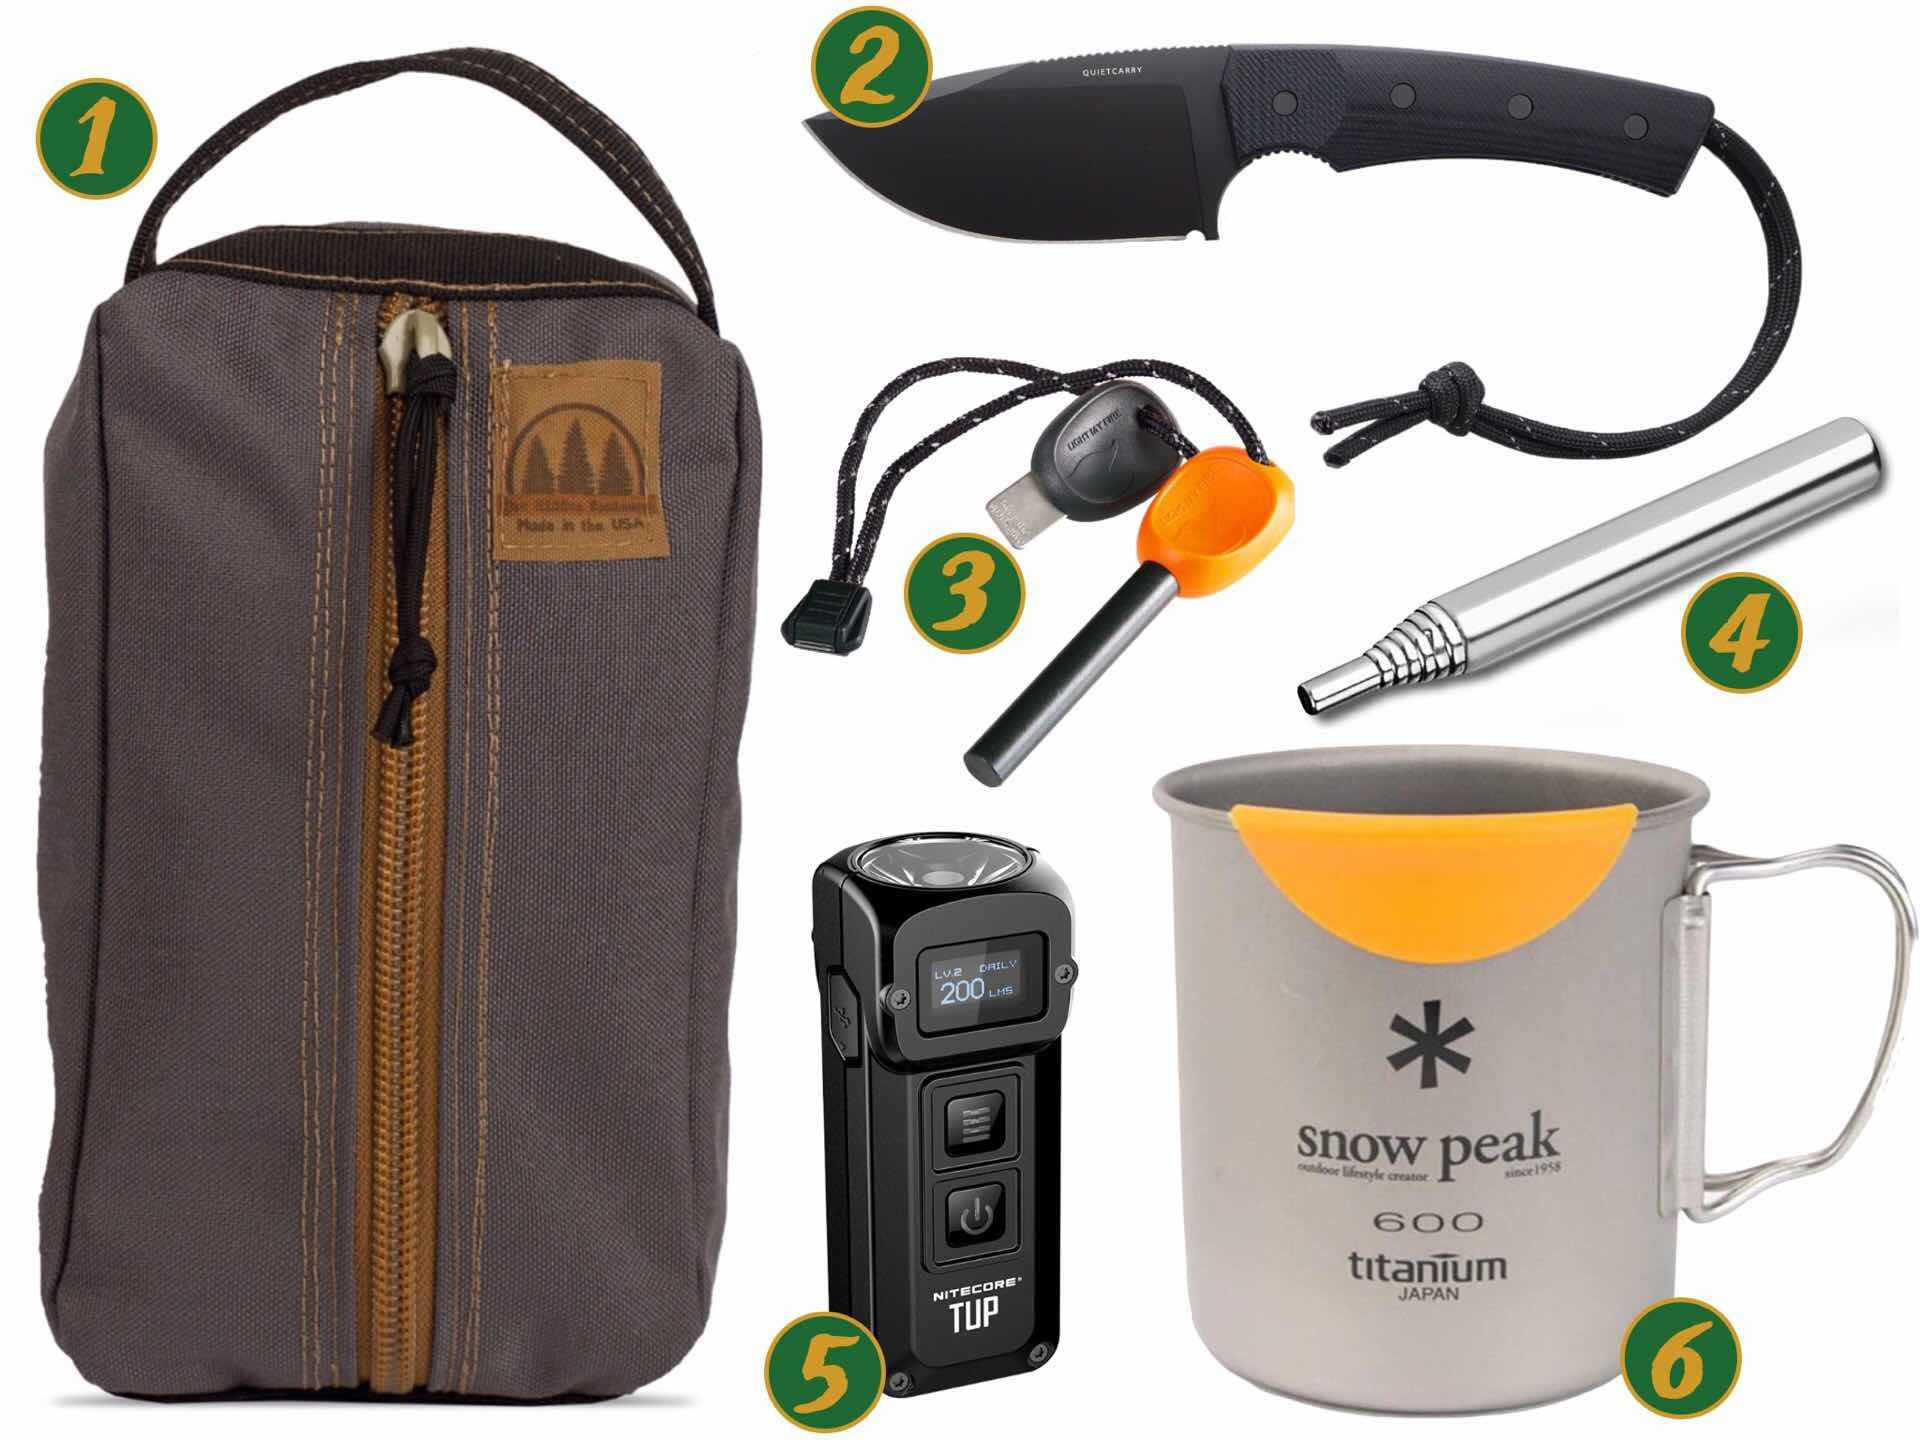 campsite-starter-kit-guide-items